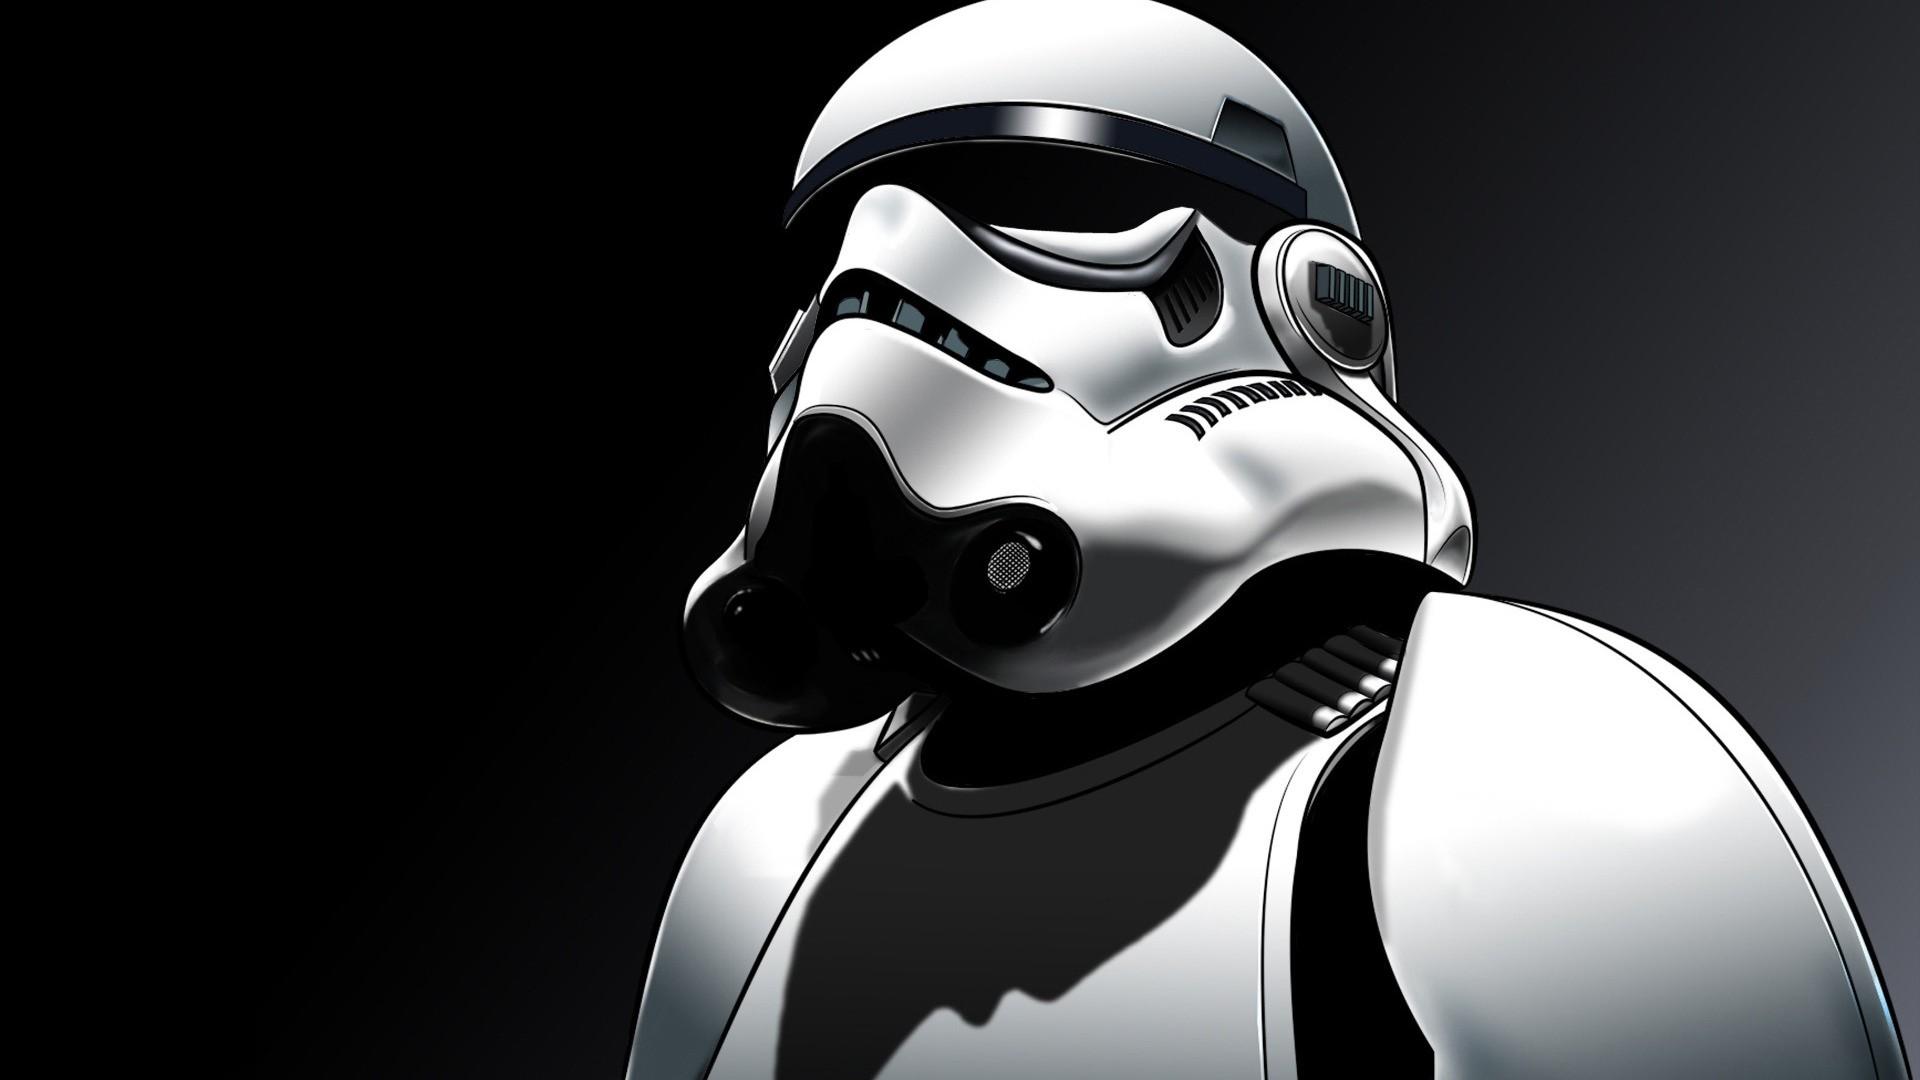 Imperial Stormtrooper Wallpaper